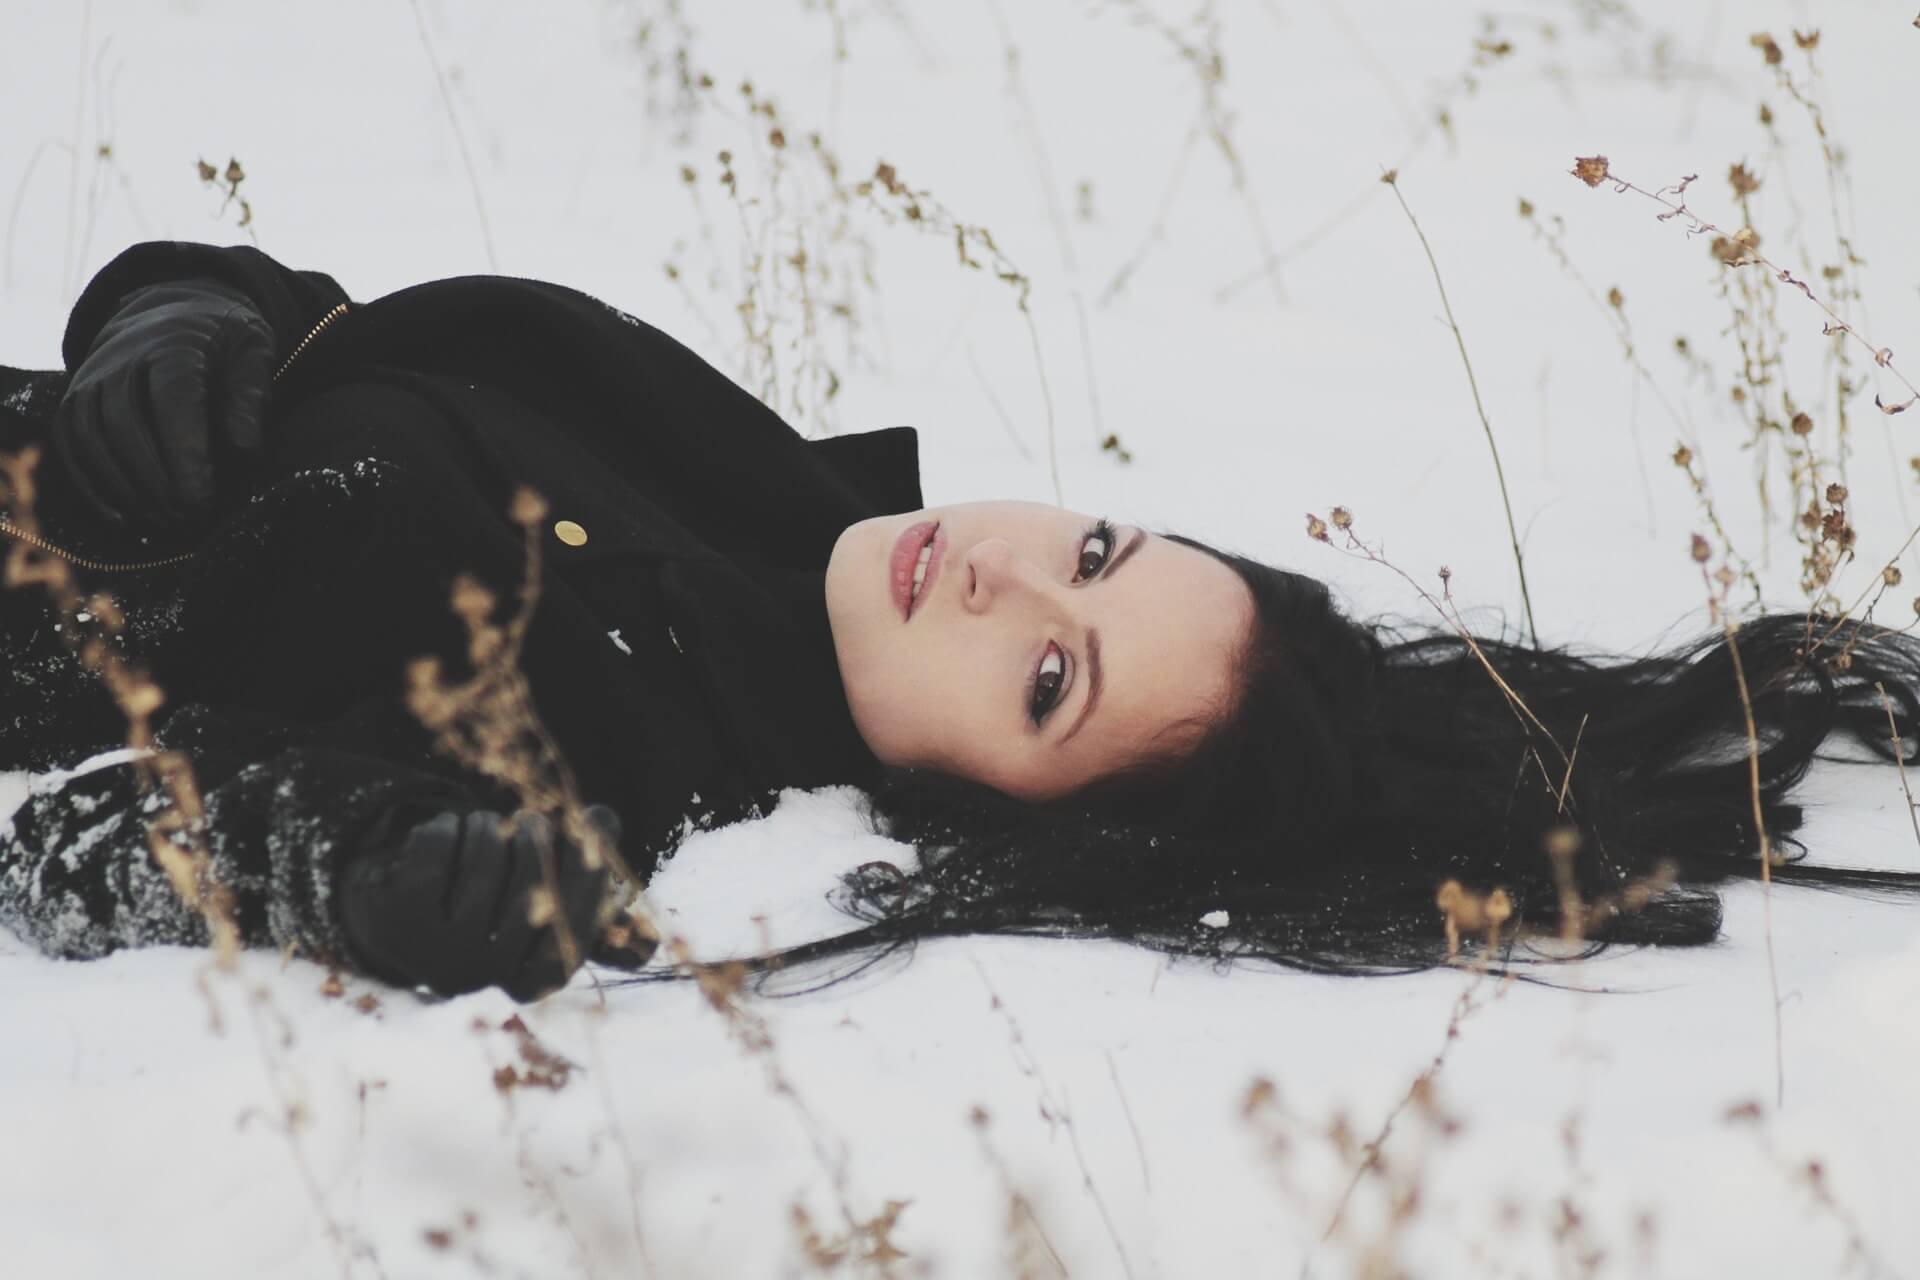 Snow Fall on Winter